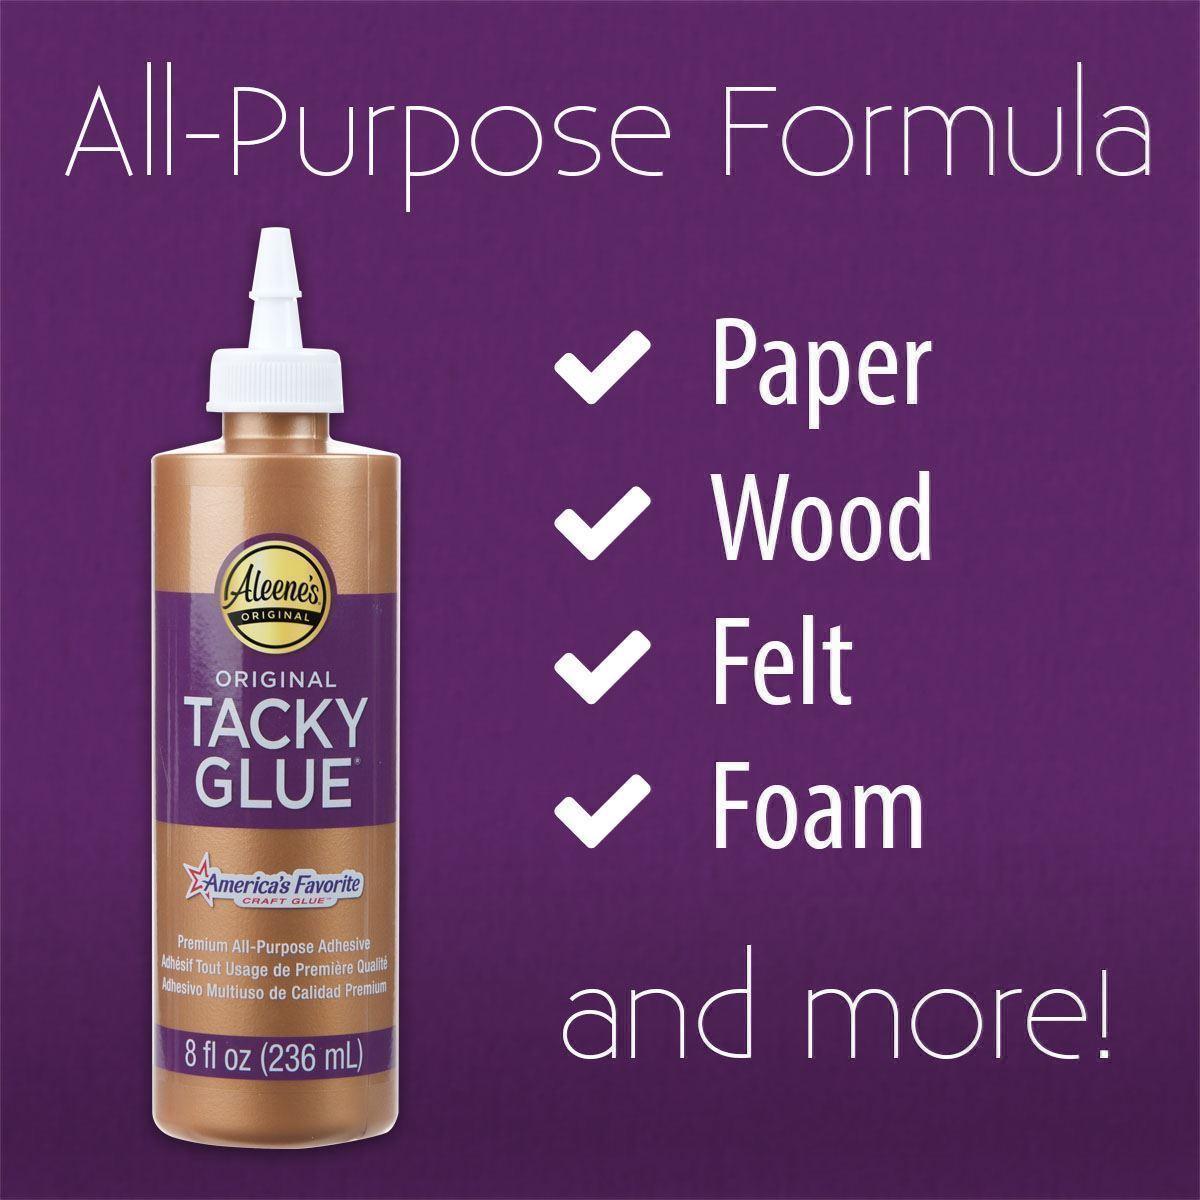 Aleene's® Original Tacky Glue All- purpose formula: Paper, wood, felt, foam and more